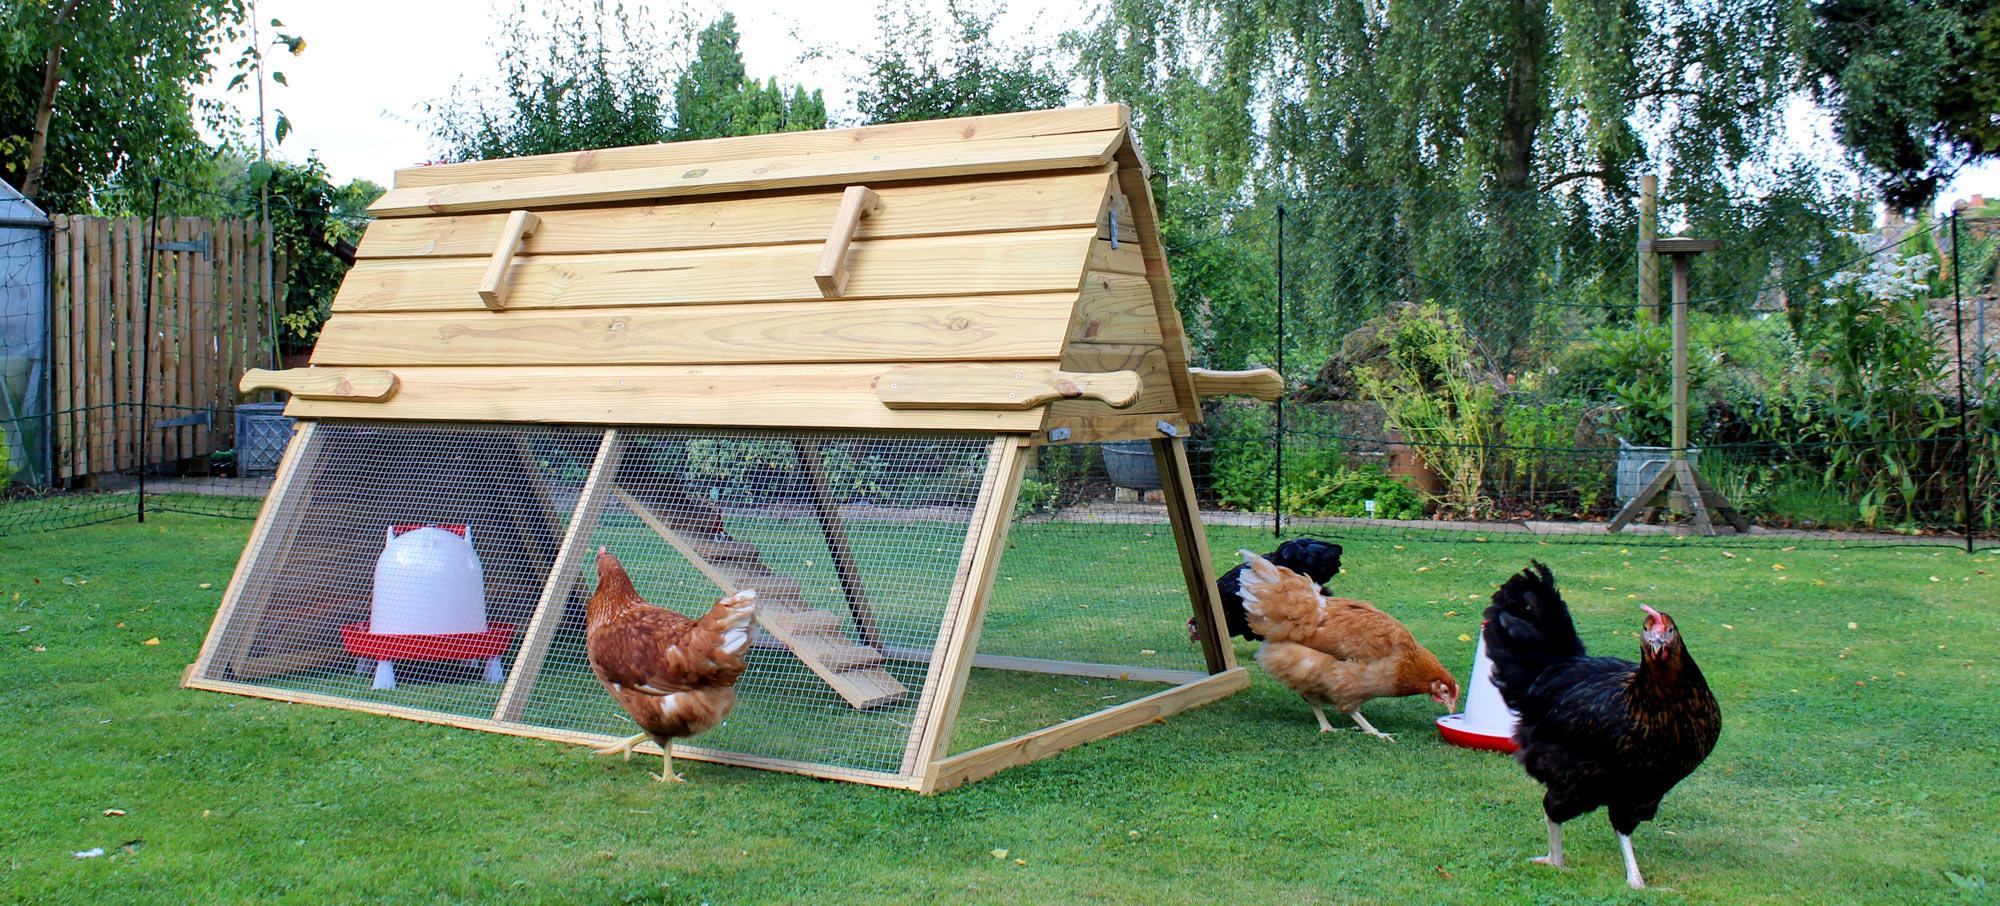 Boughton Chicken Coop